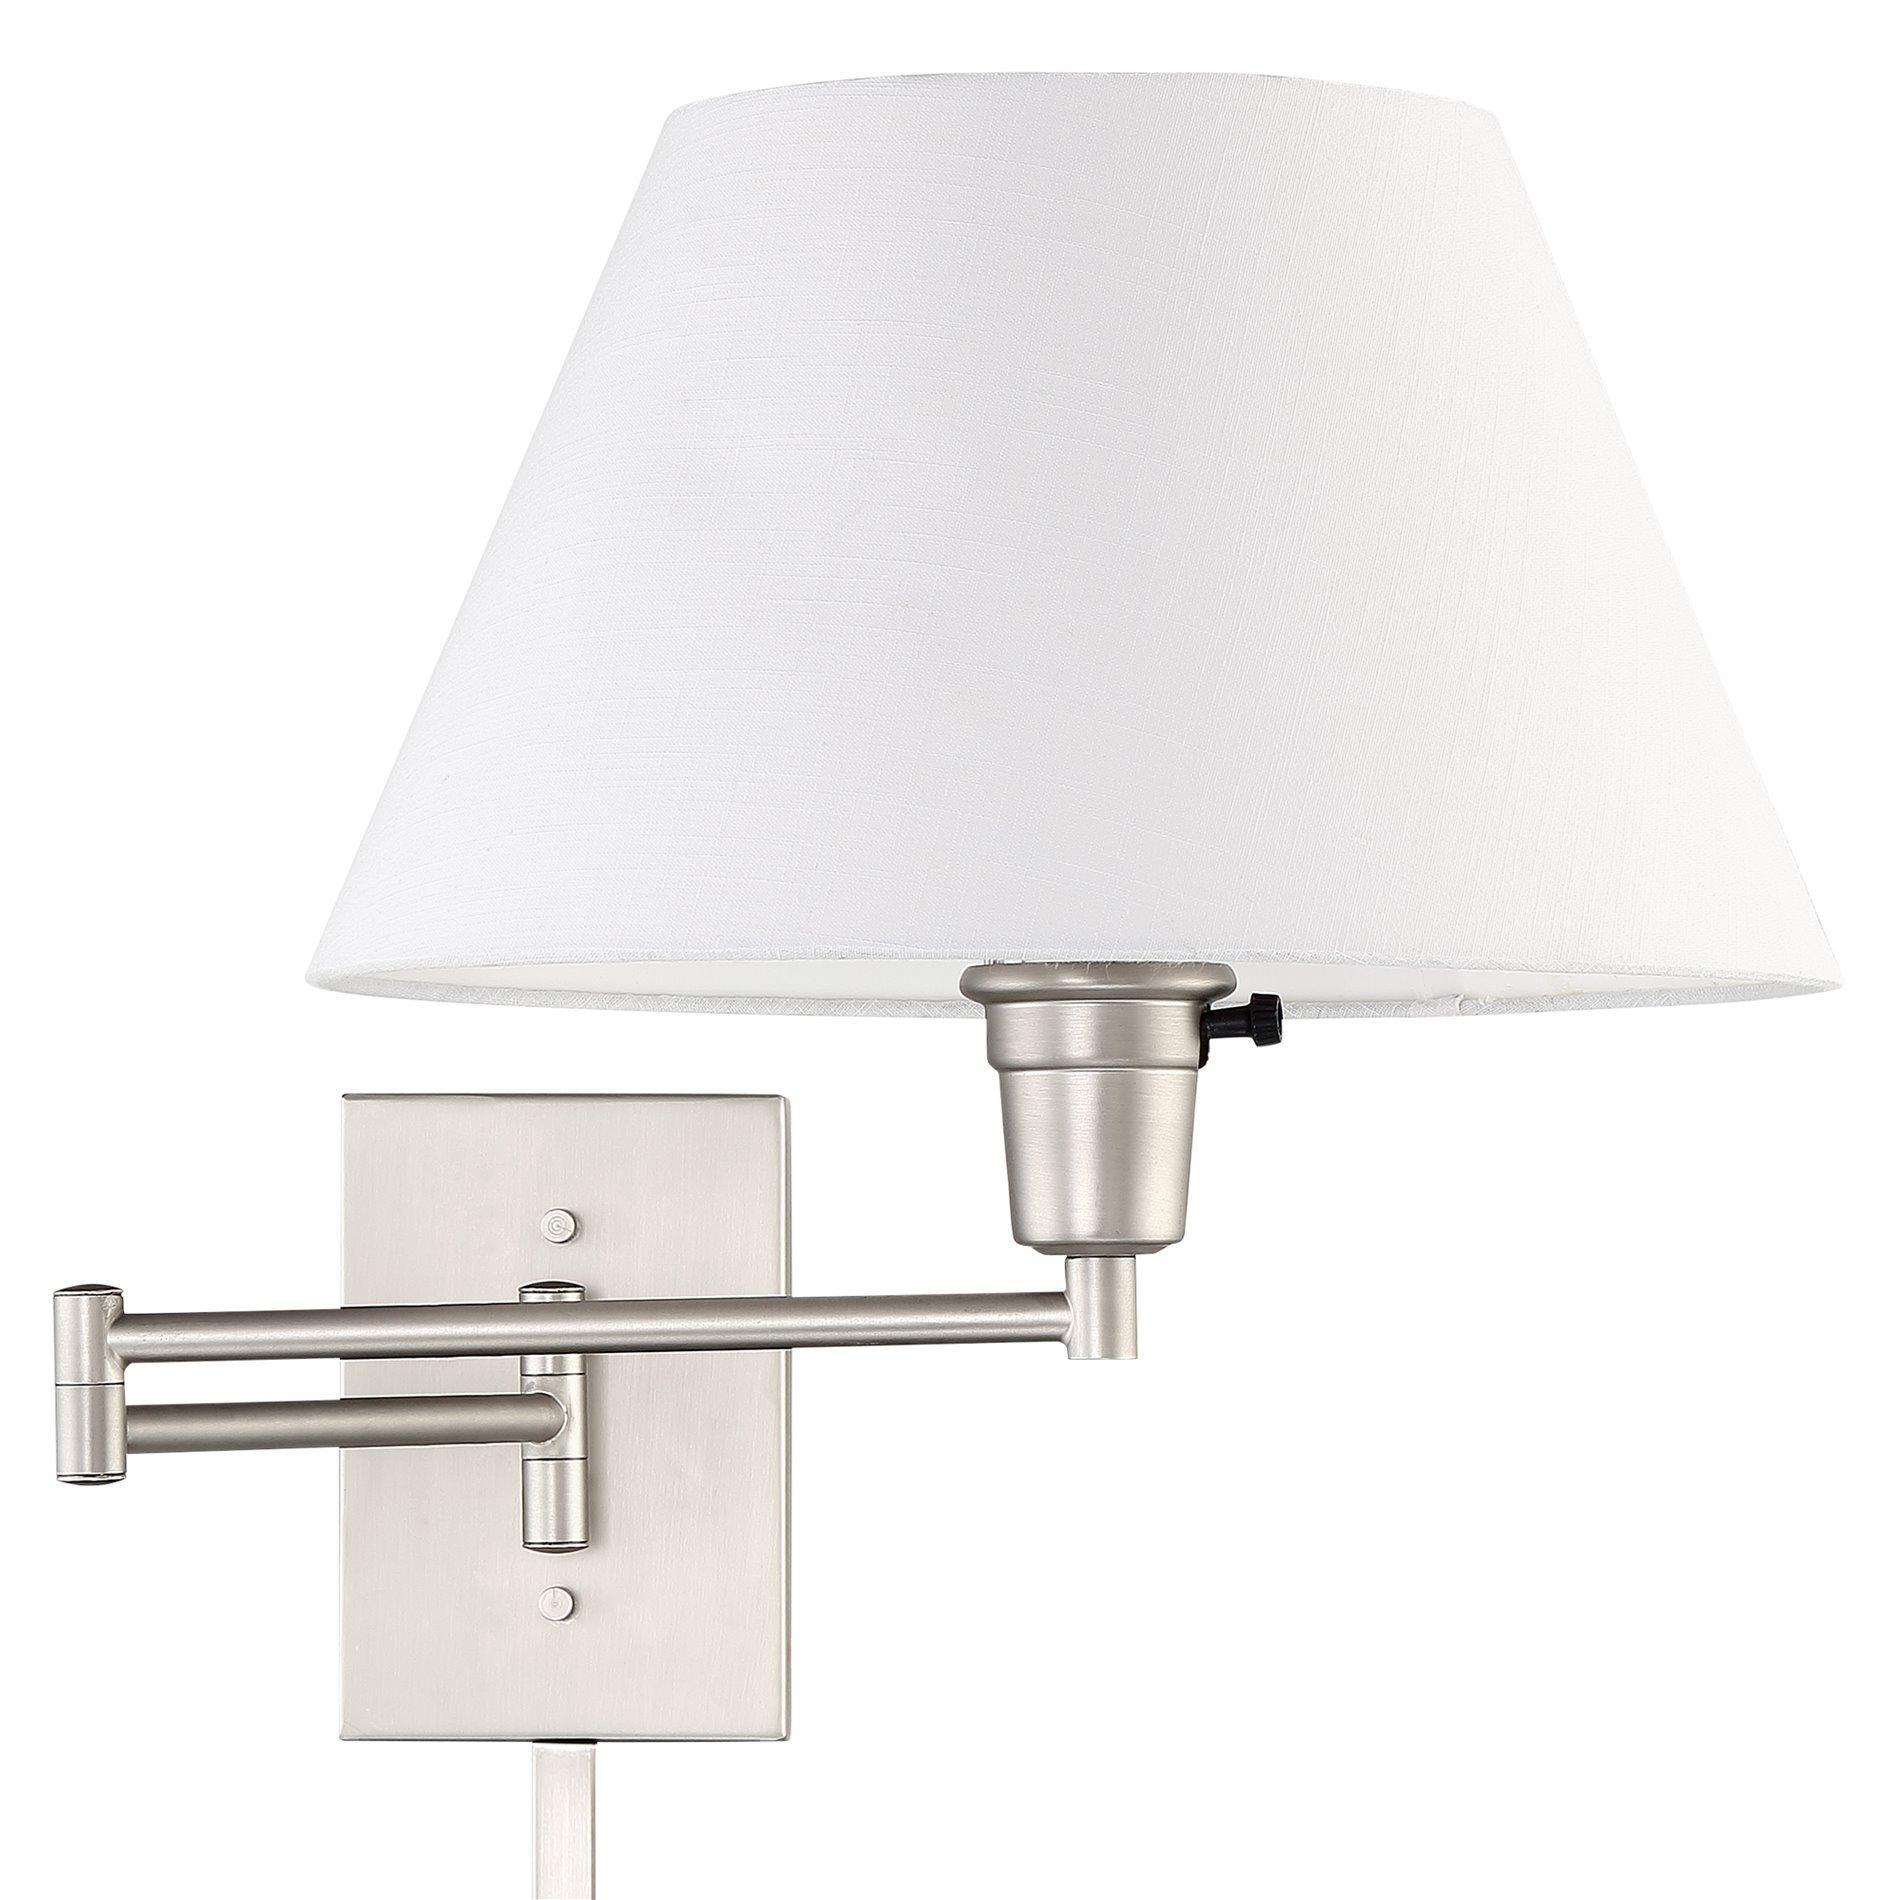 Kira Home Cambridge 13'' Swing Arm Wall Lamp - Plug in/Wall Mount + White Fabric Shade, 150W 3-Way + Cord Covers, Satin Nickel Finish